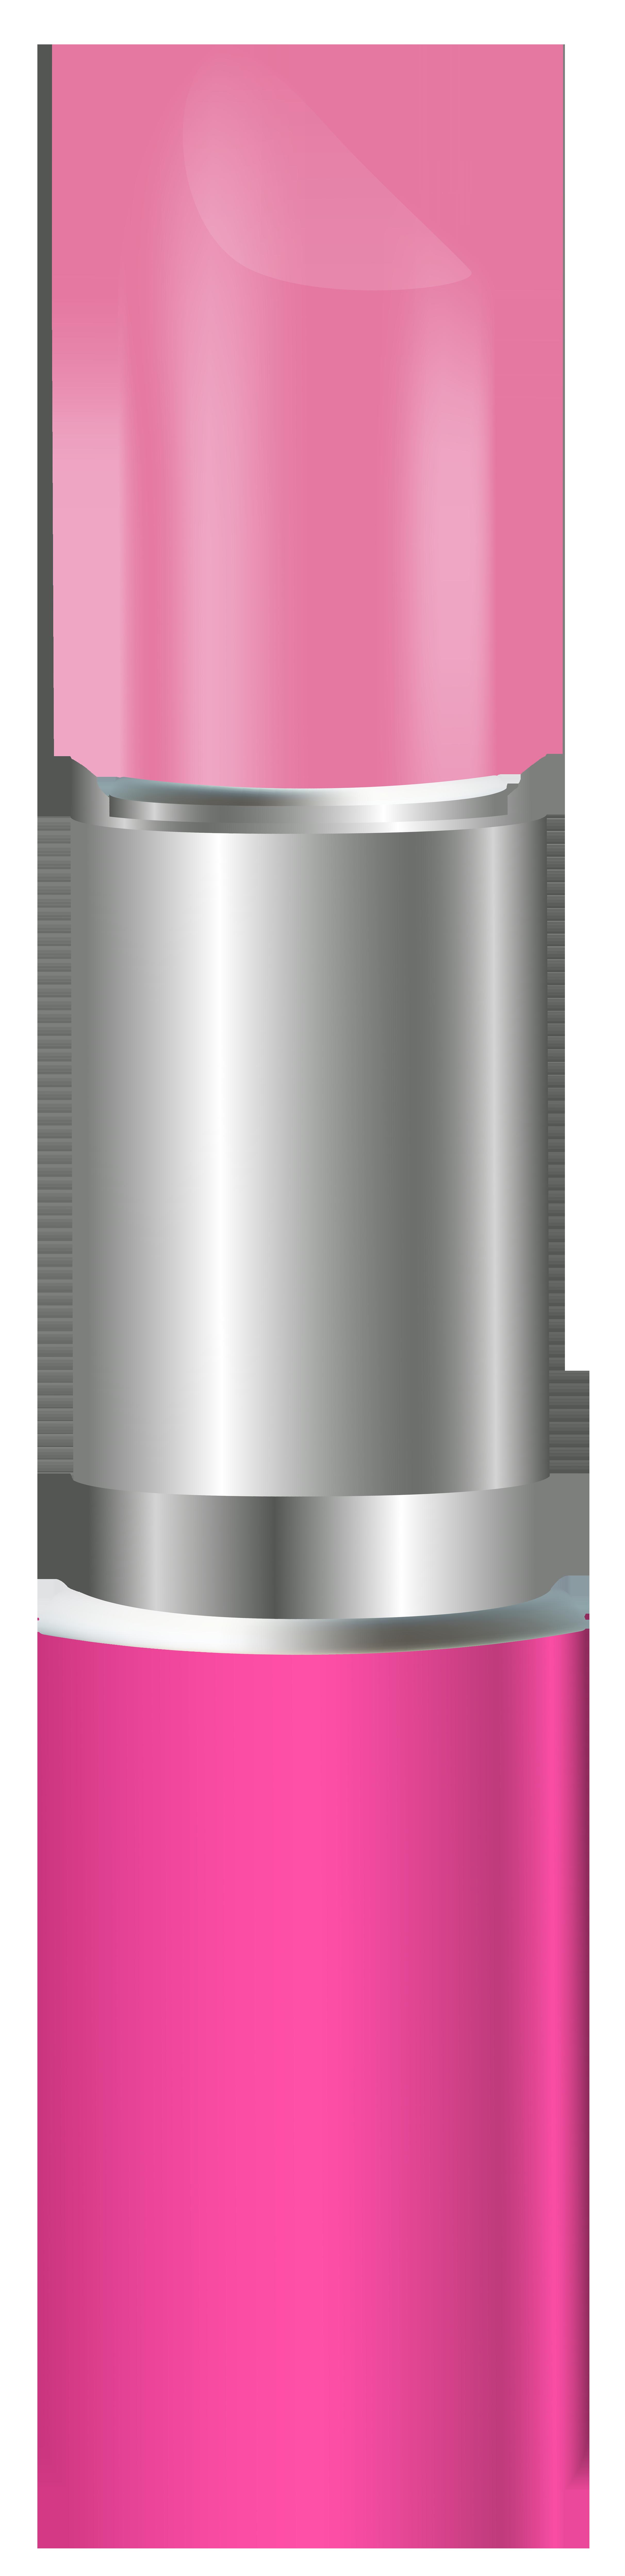 Lipstick clipart Tags: Lipstick Art Clipartner Lipstick